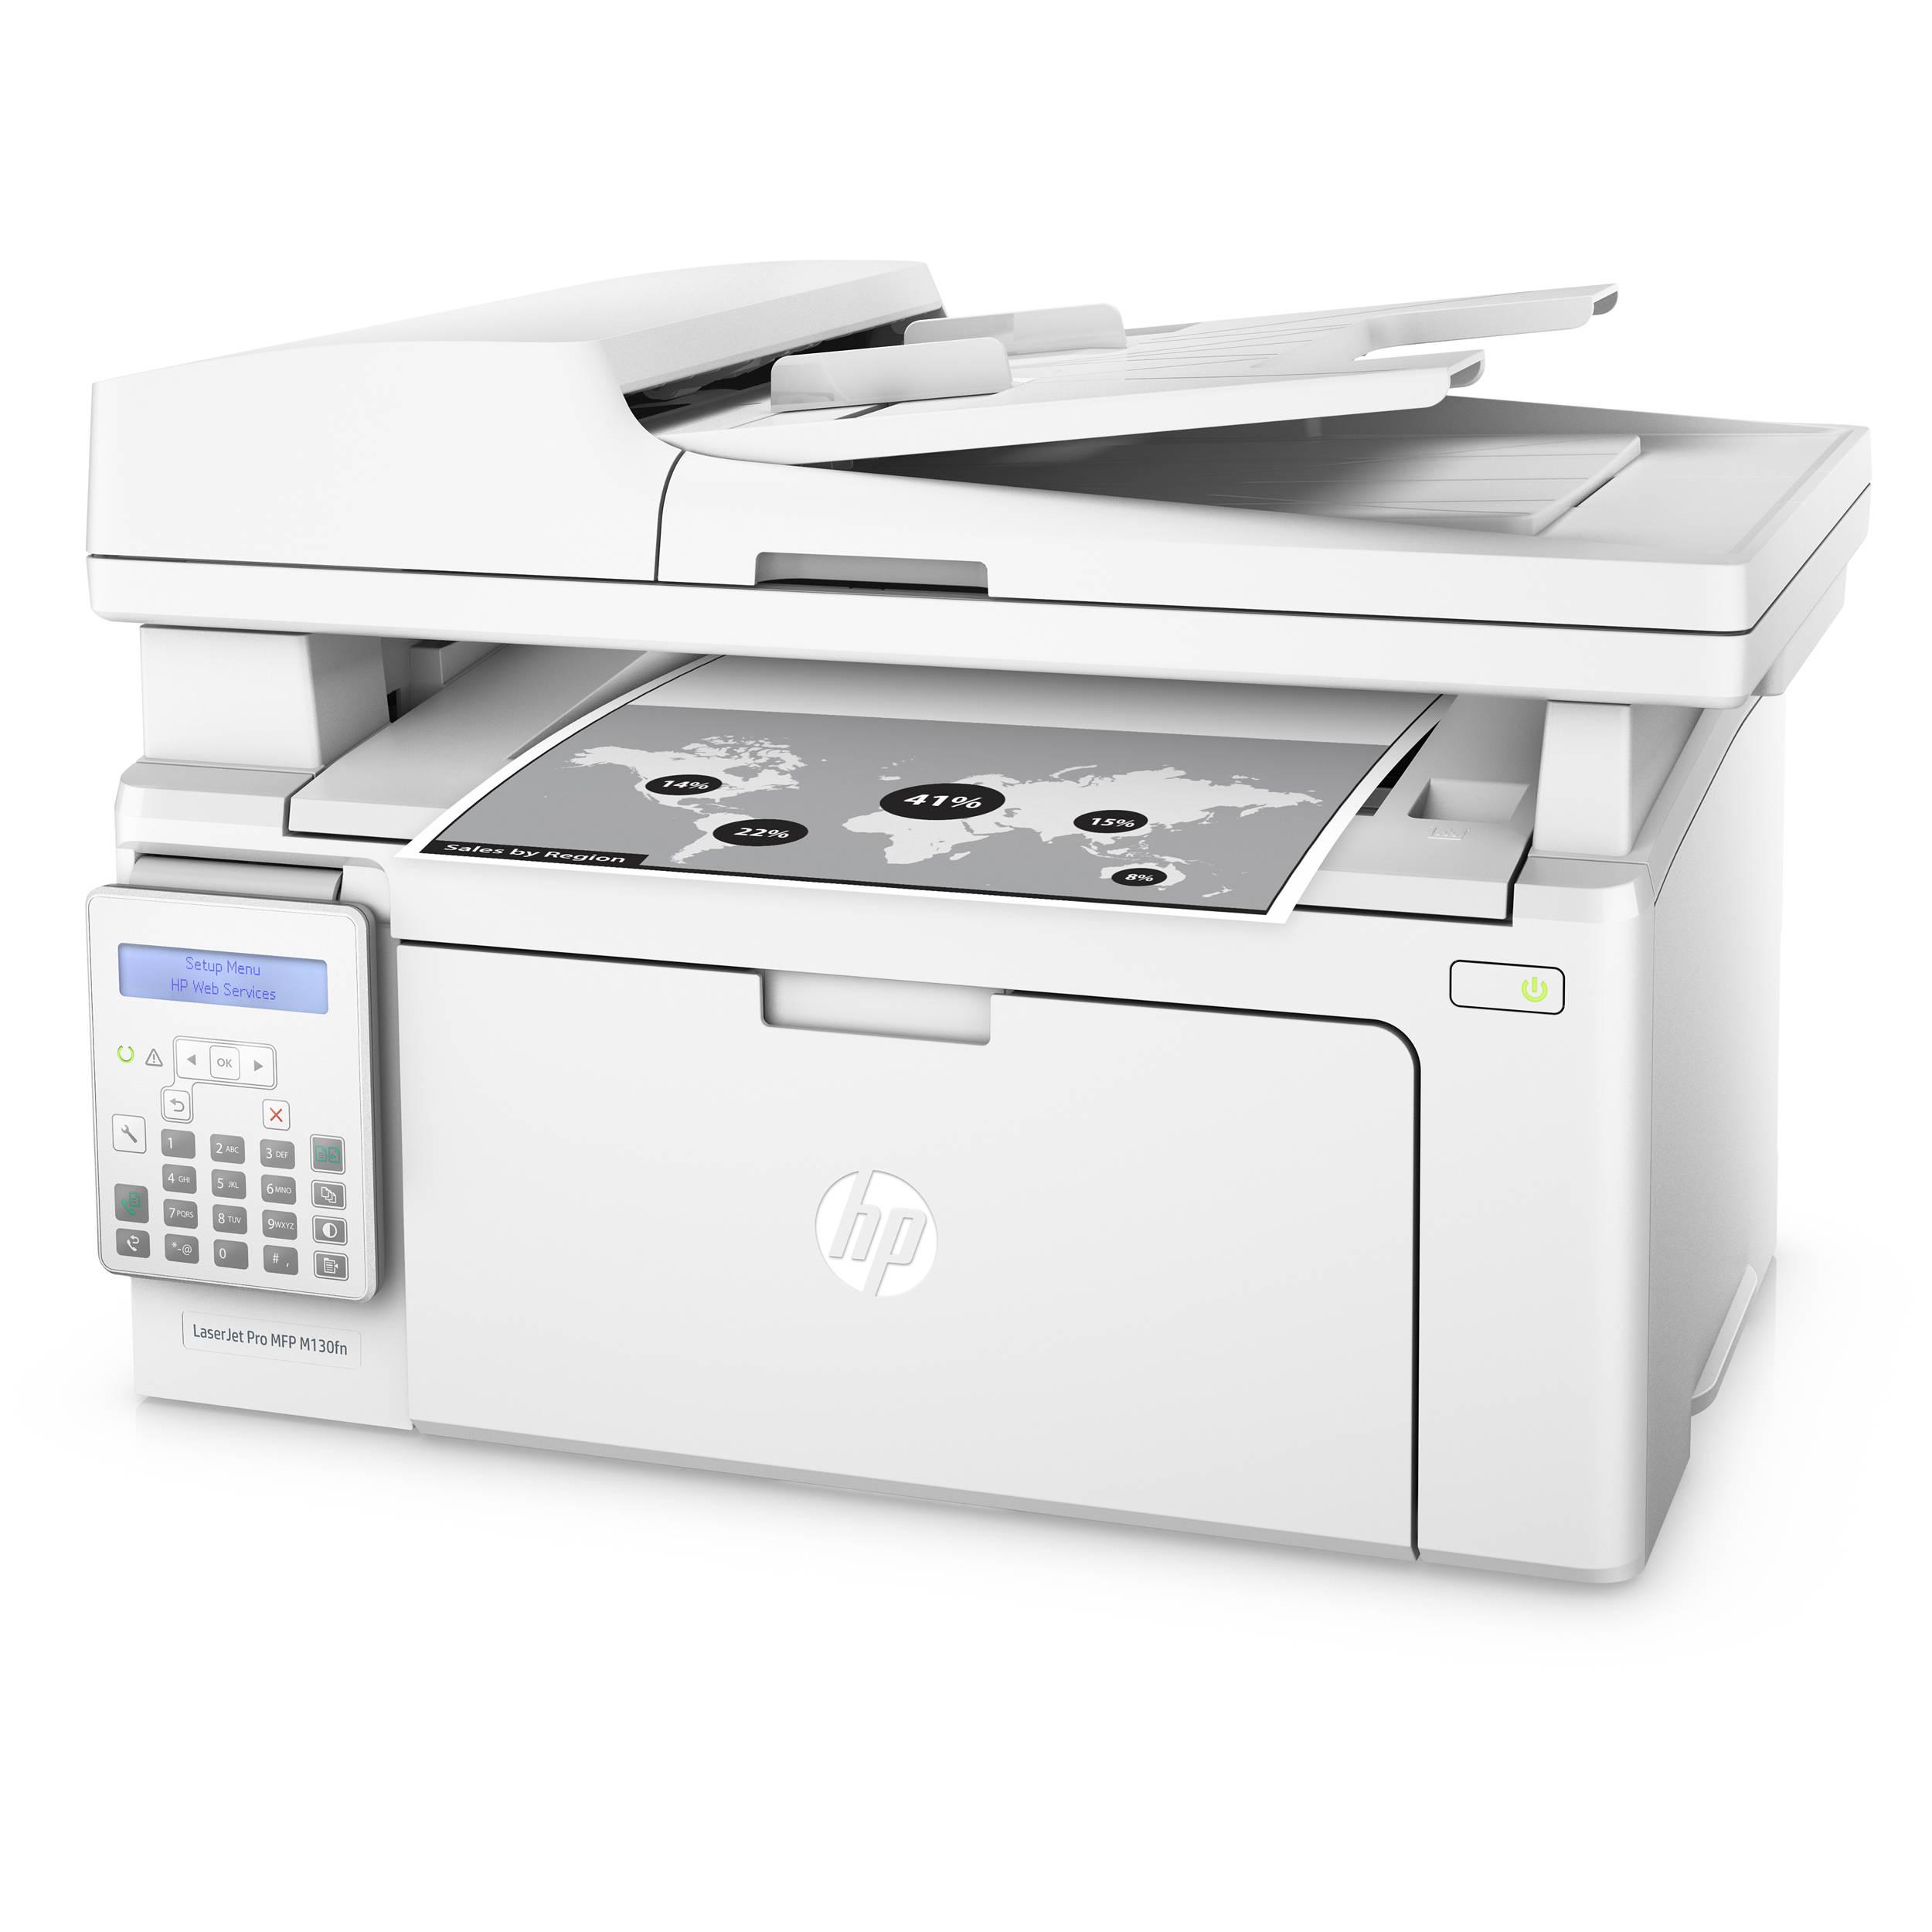 bfedad6a35b6 HP LaserJet Pro M130fn All-in-One Monochrome Laser Printer